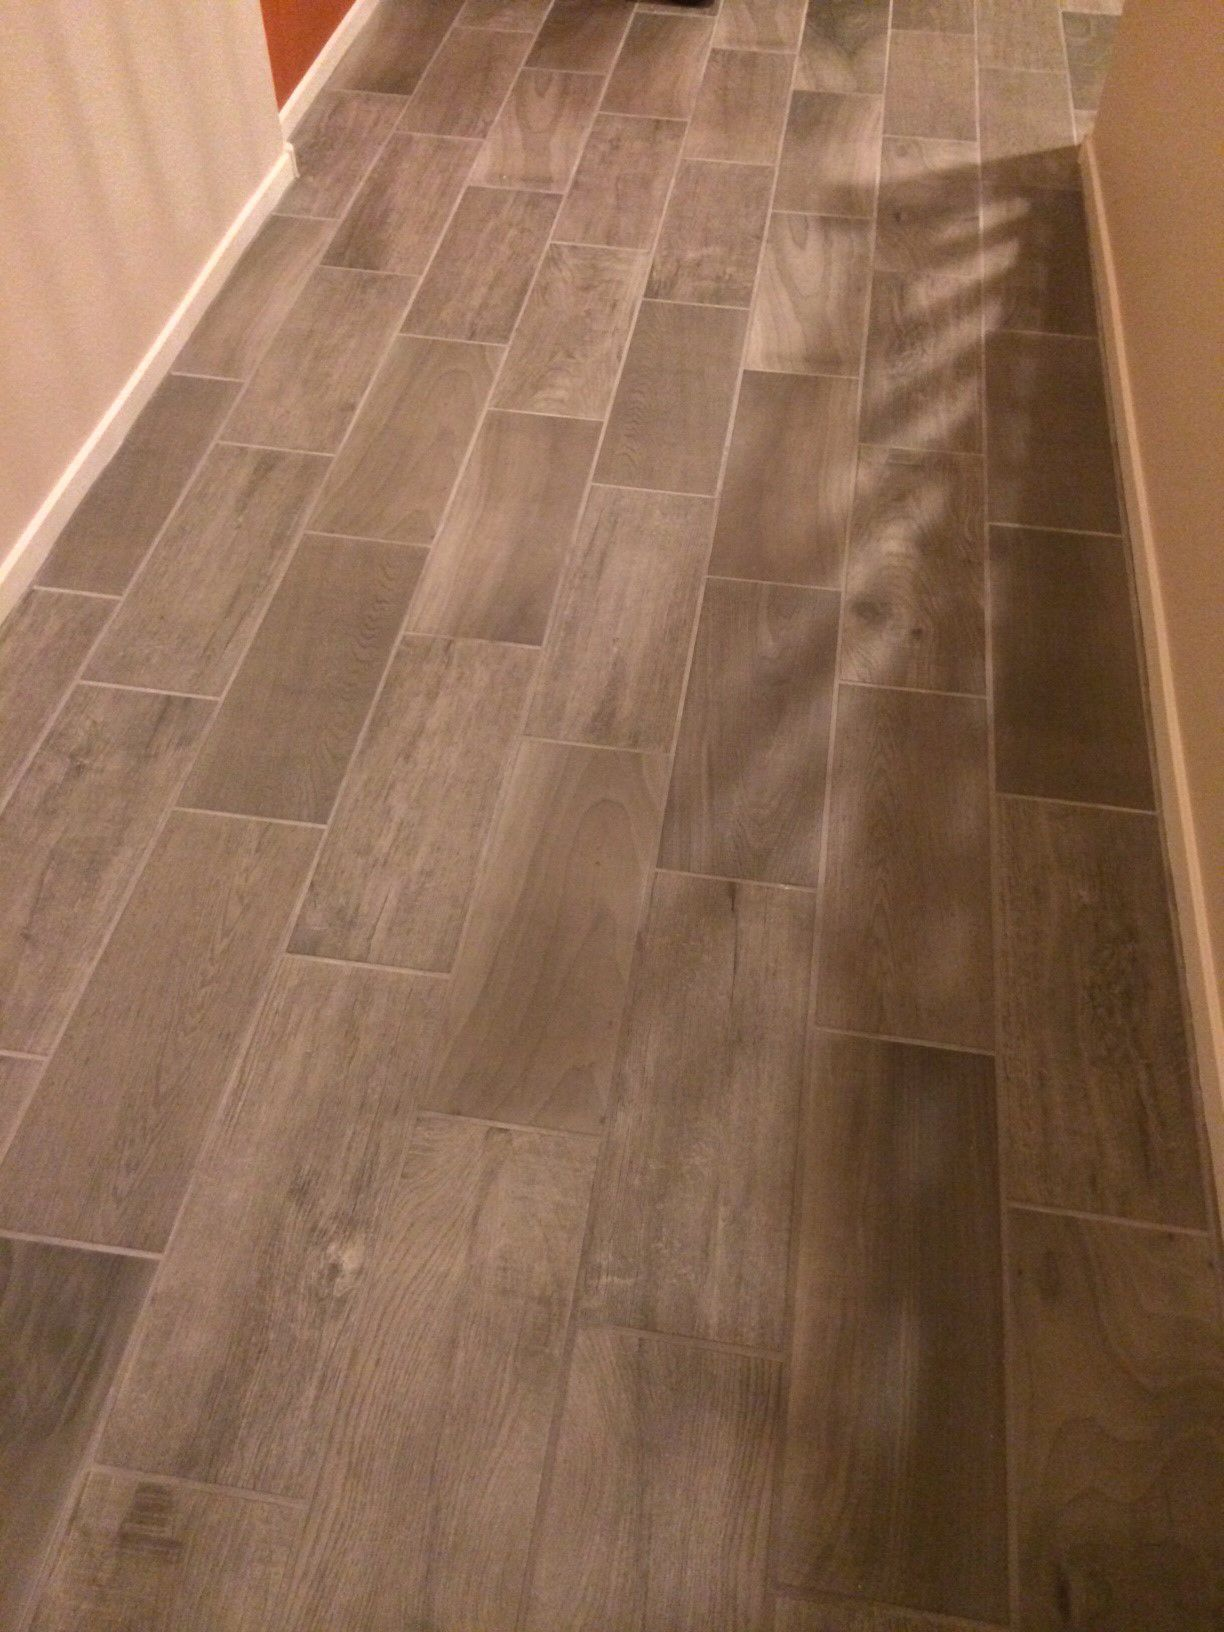 Emblem Color Gray Em03 Daltile Ceramic Wood Looks